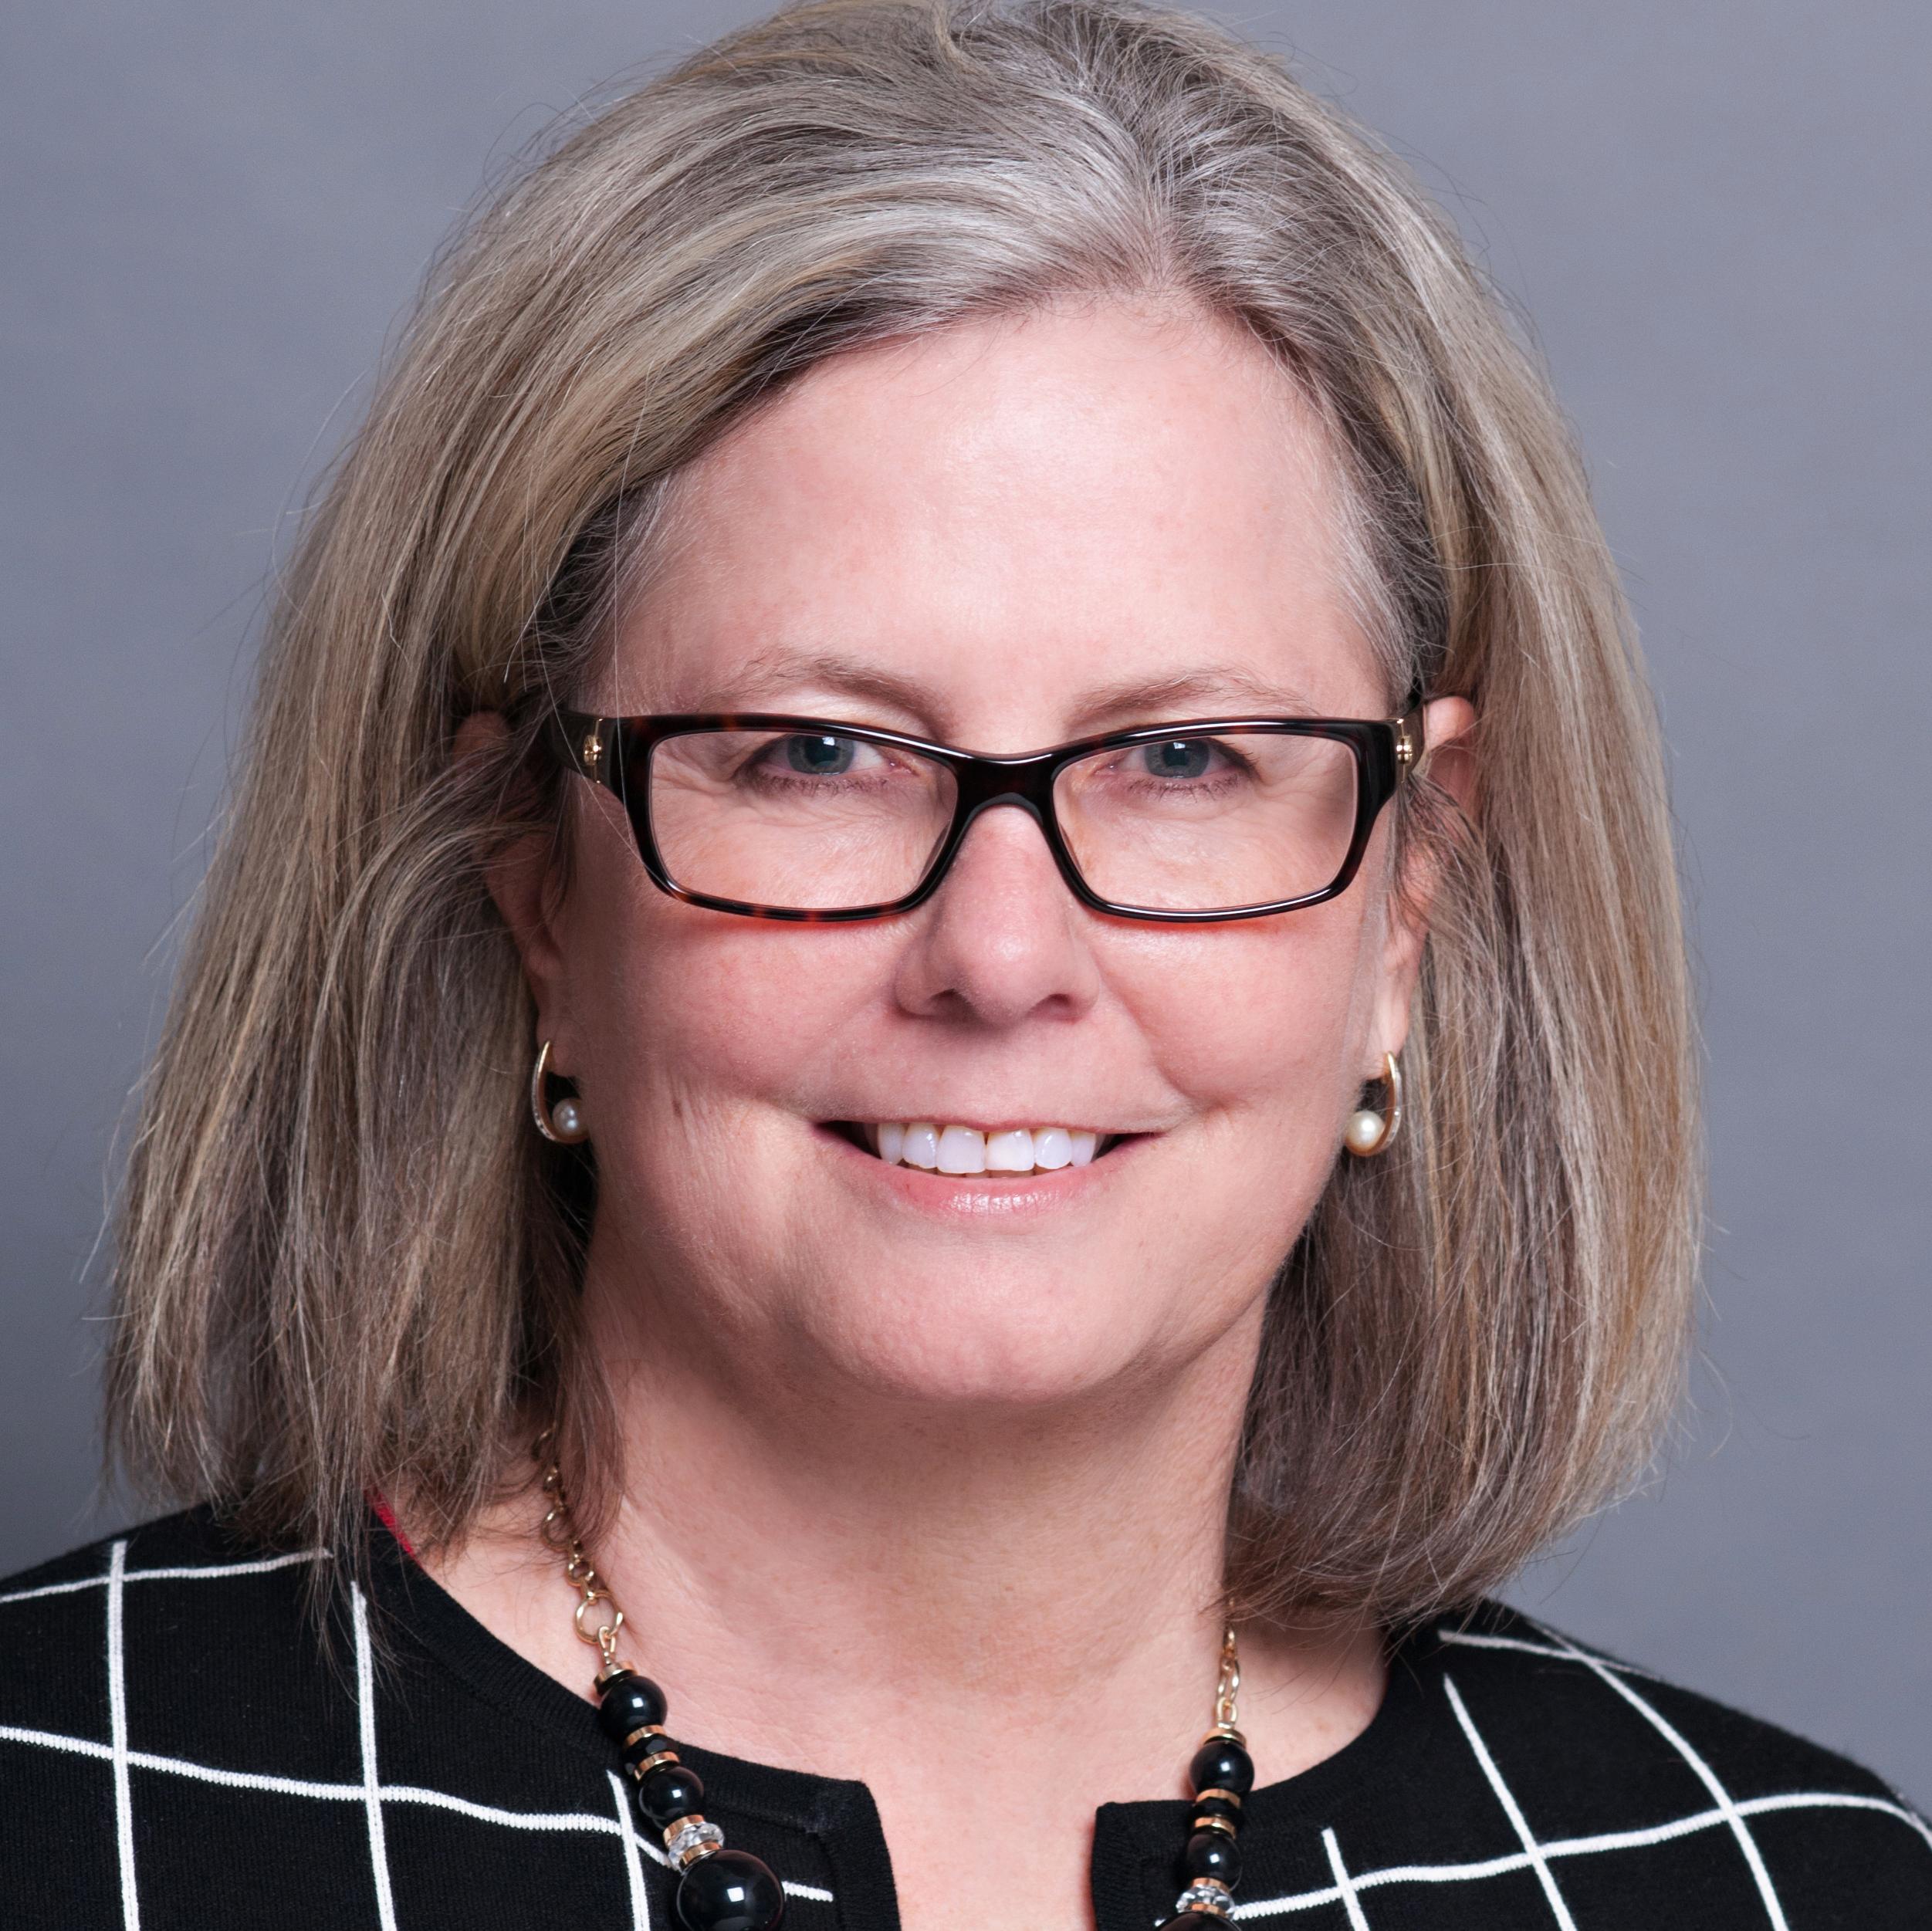 Dr. Nora K. Carr